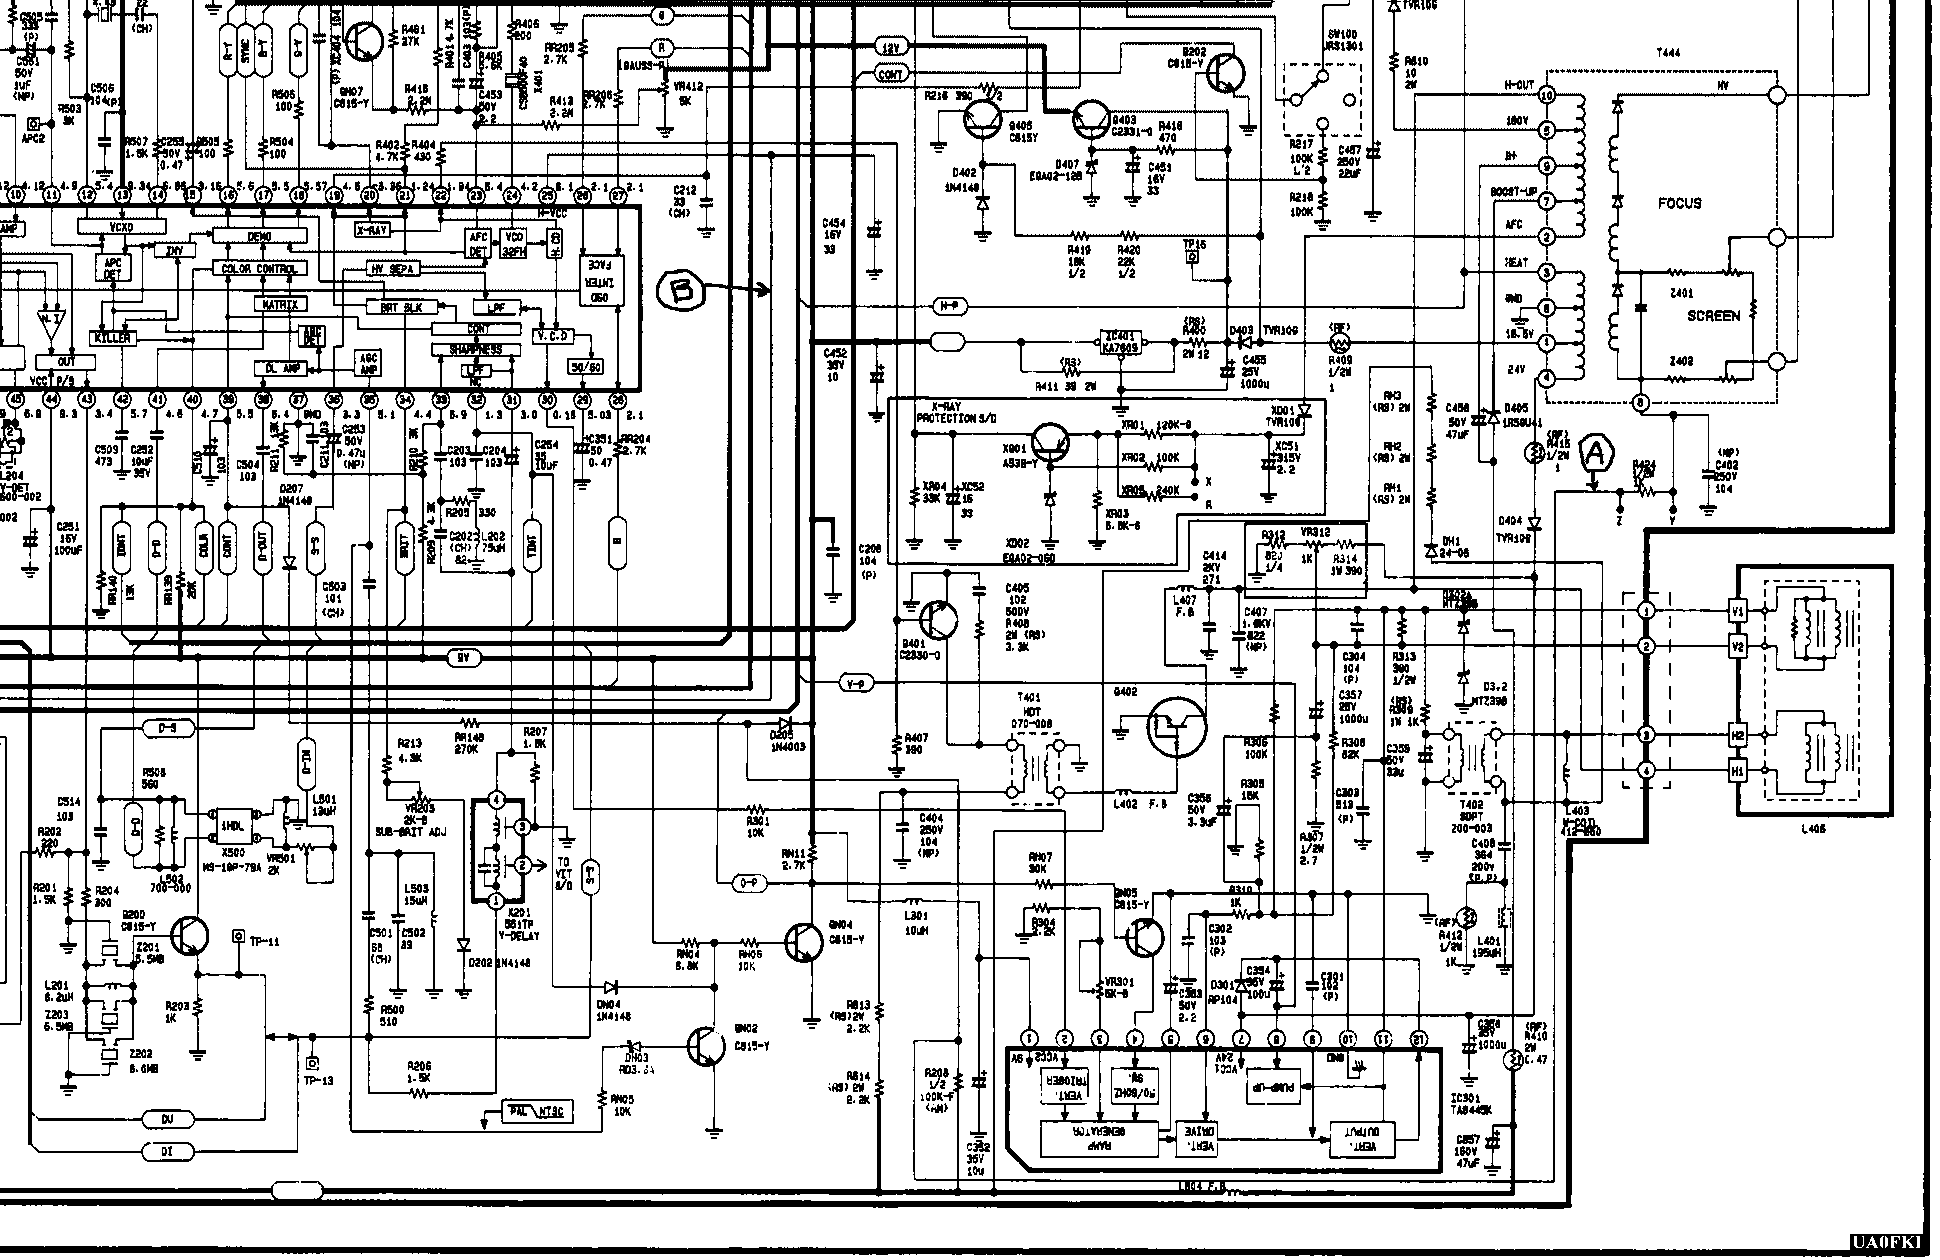 Rolsen c21usr85 шасси kd-035s схема